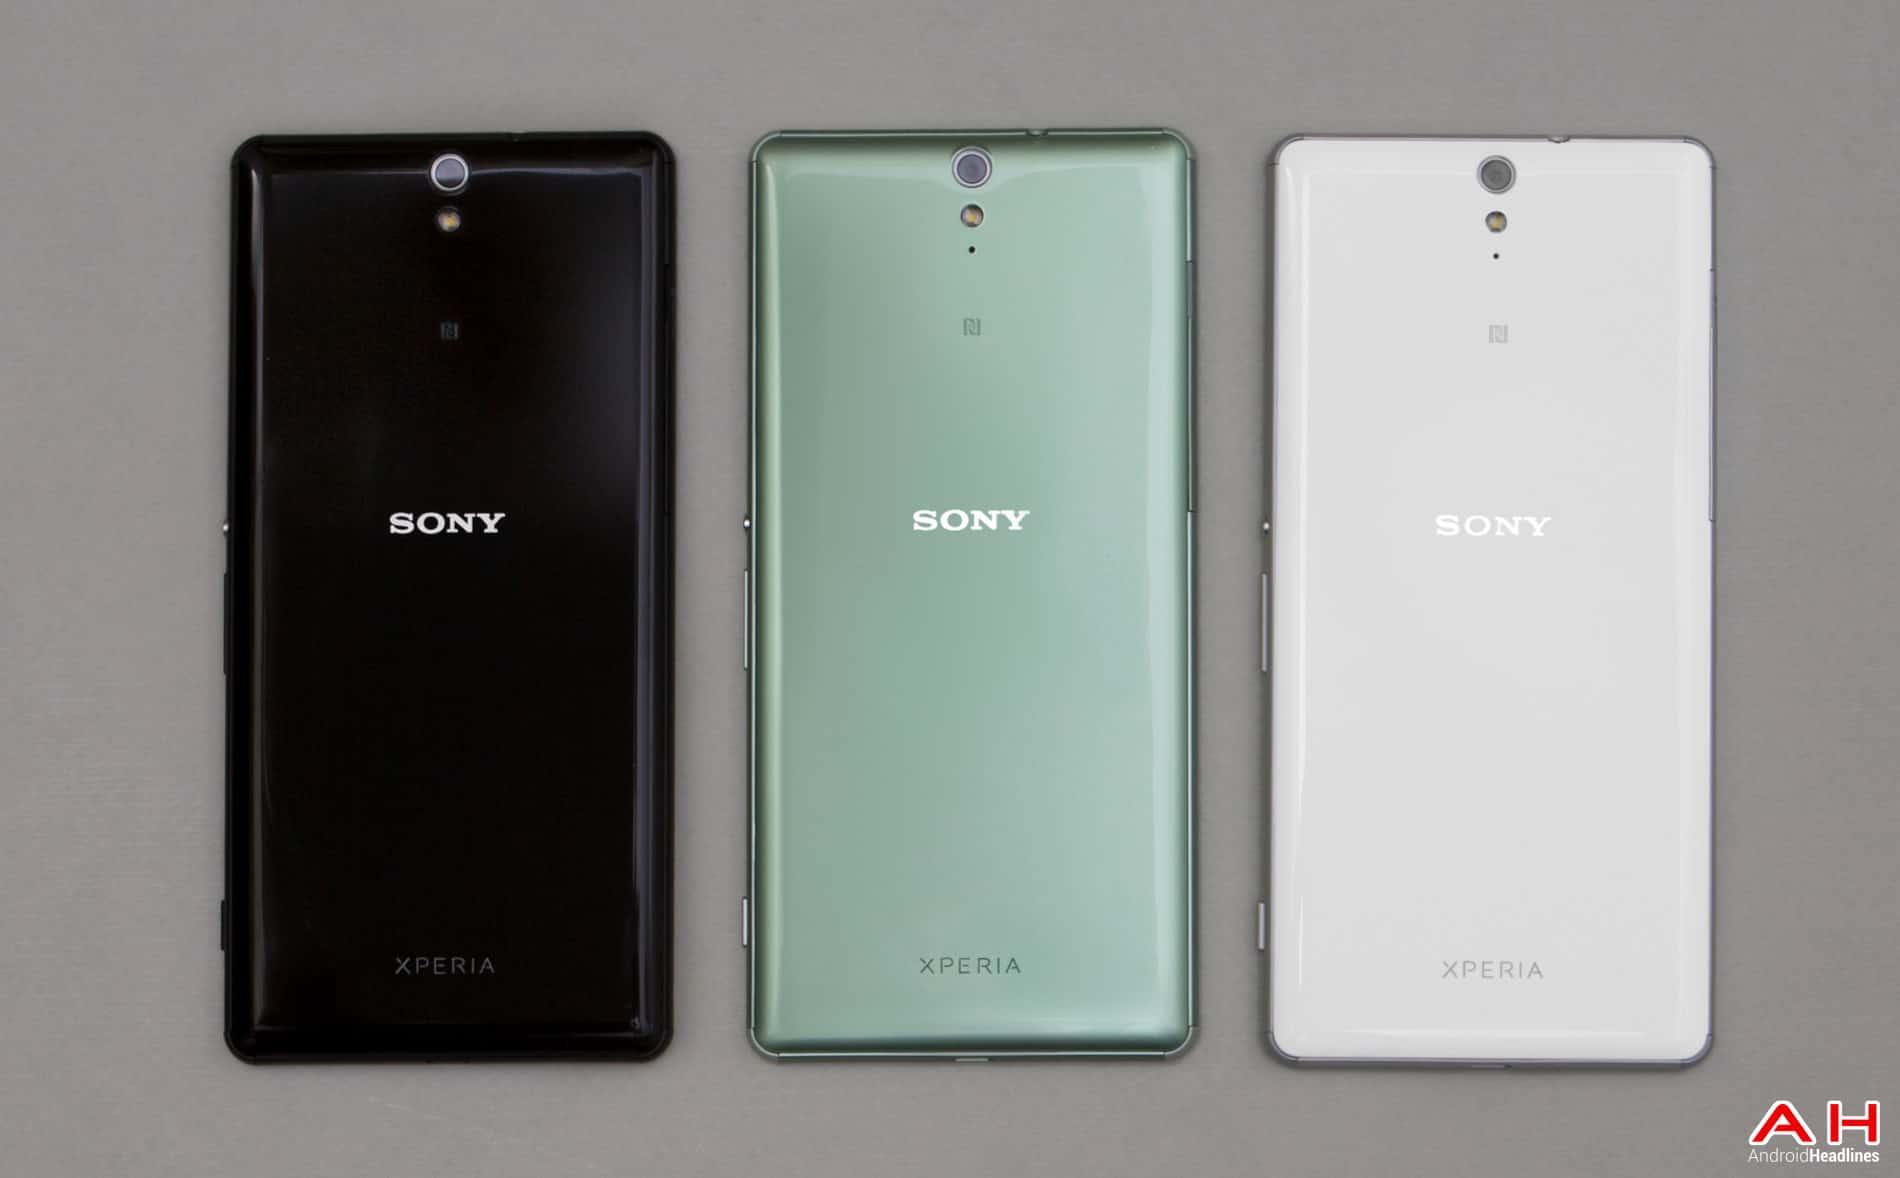 AH Sony Xperia C5 Ultra Press Images 3